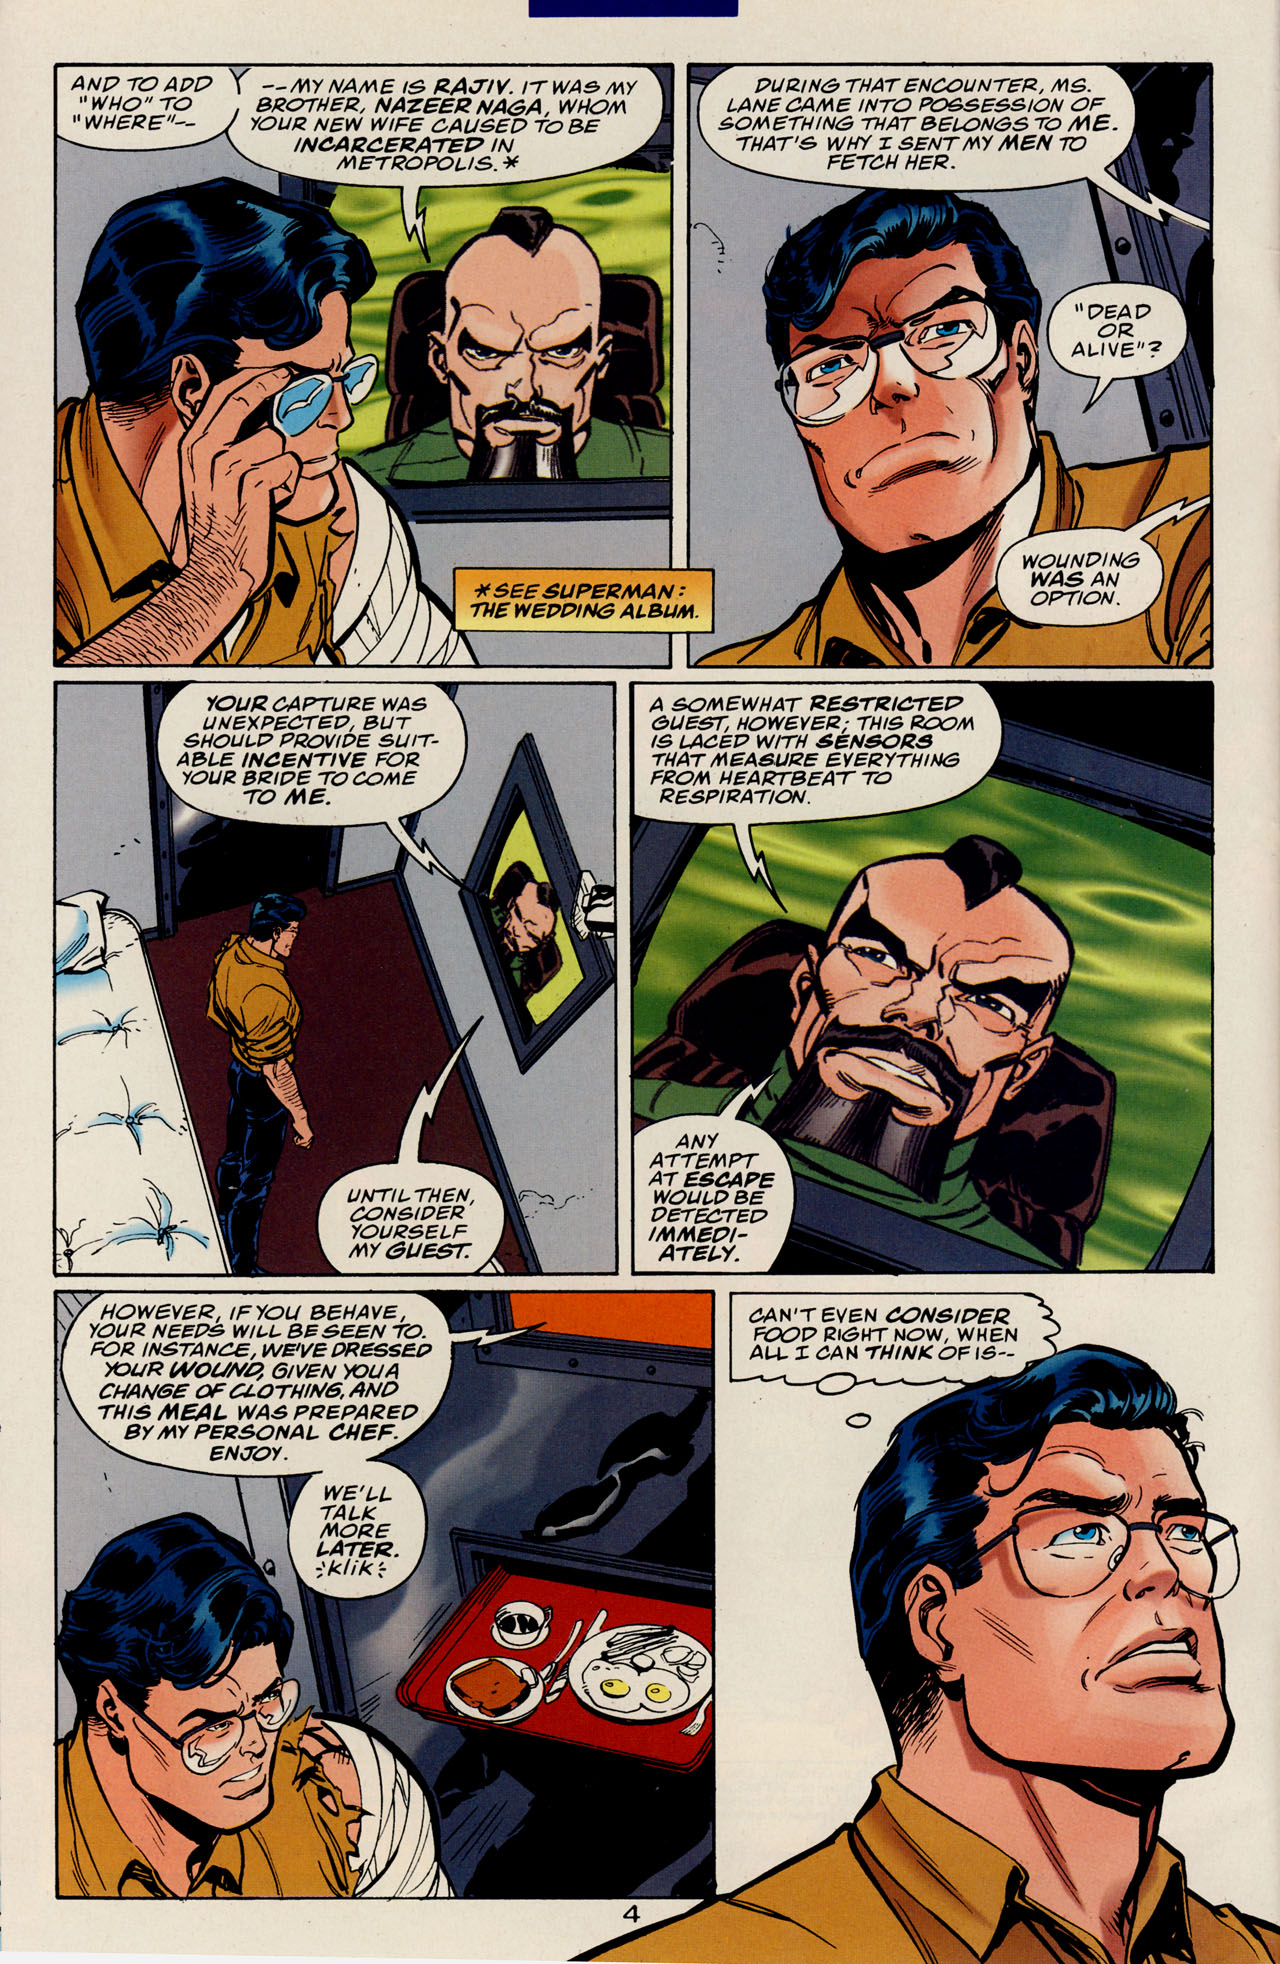 Action Comics (1938) 728 Page 4